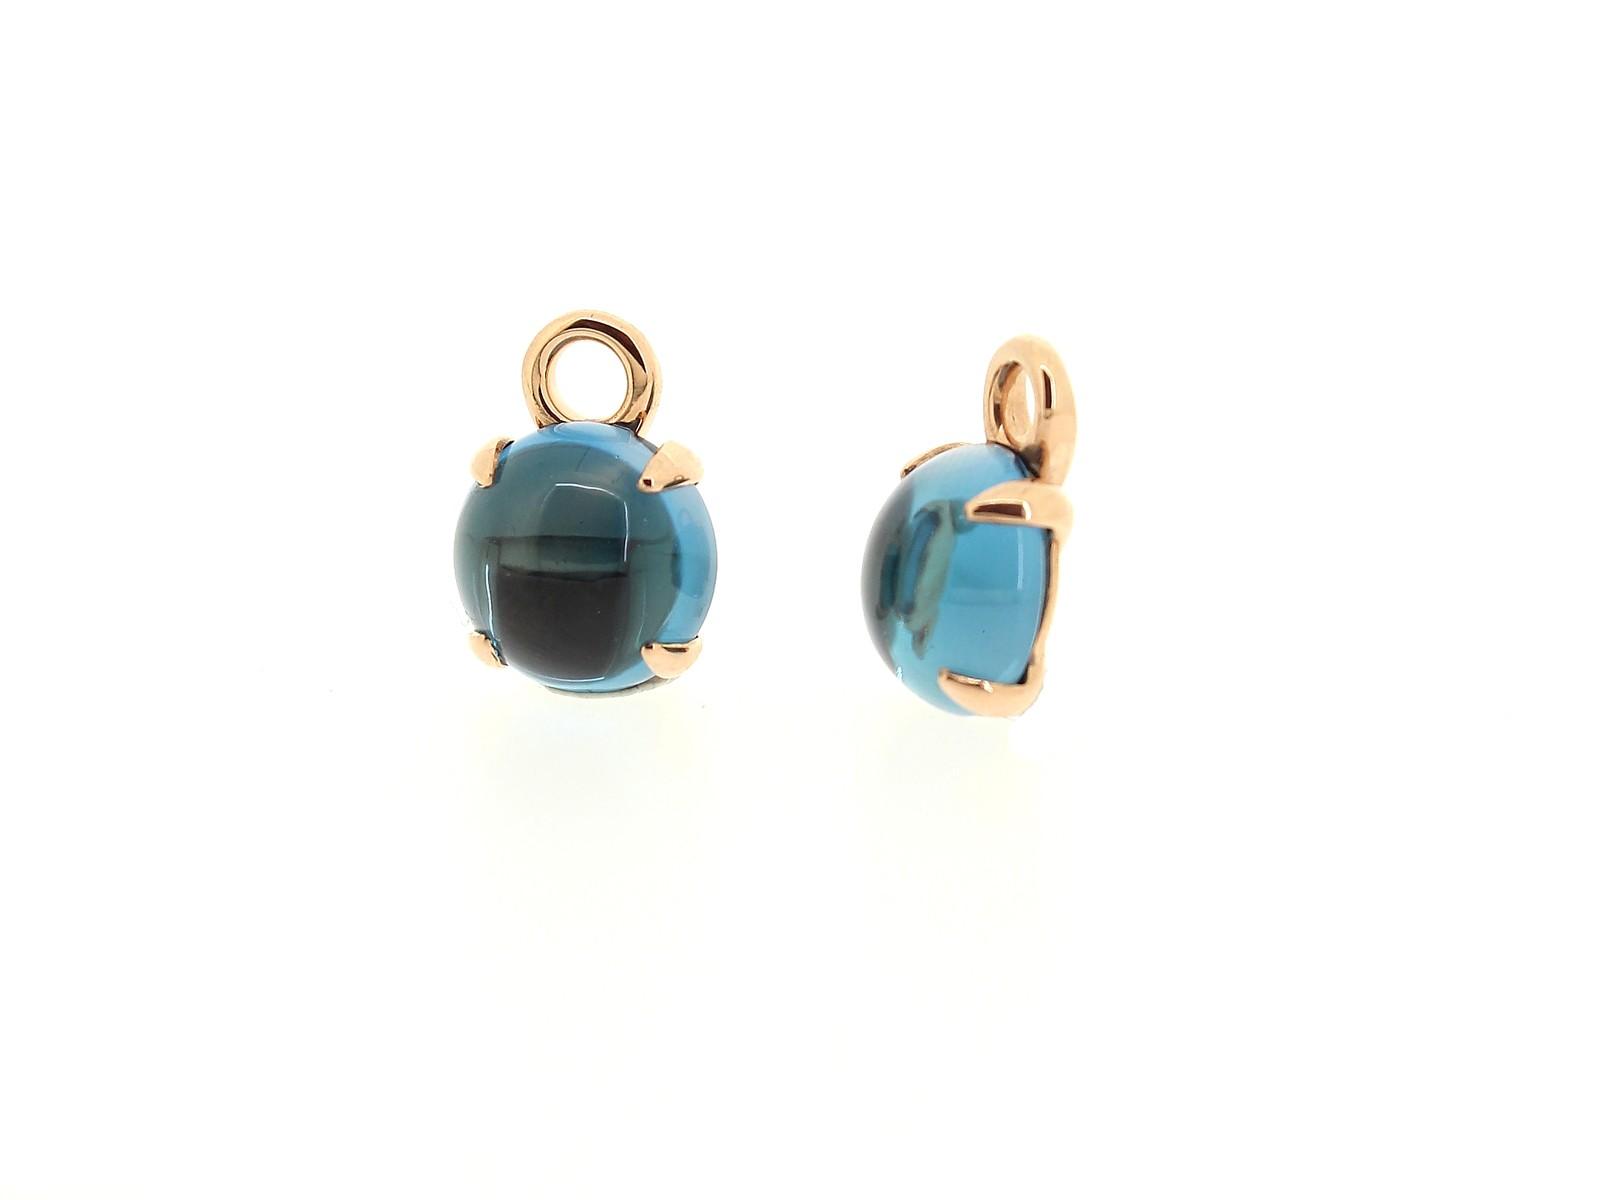 Einhänger London Blue Topas - GalerieVoigt - FO1570R14